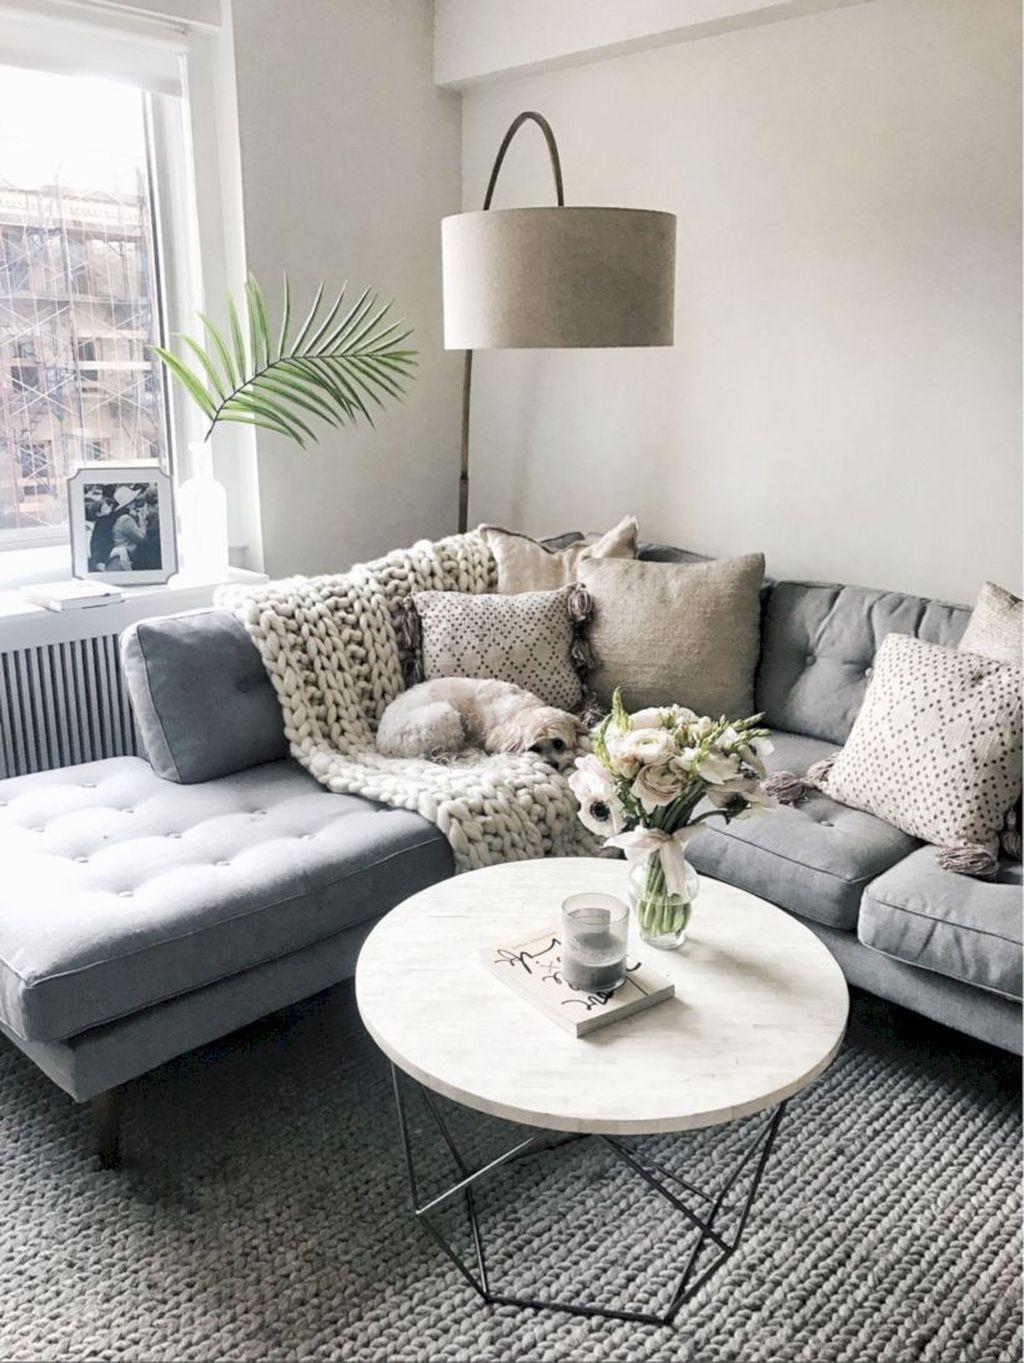 Inspiring Small Living Room Decor Ideas 07